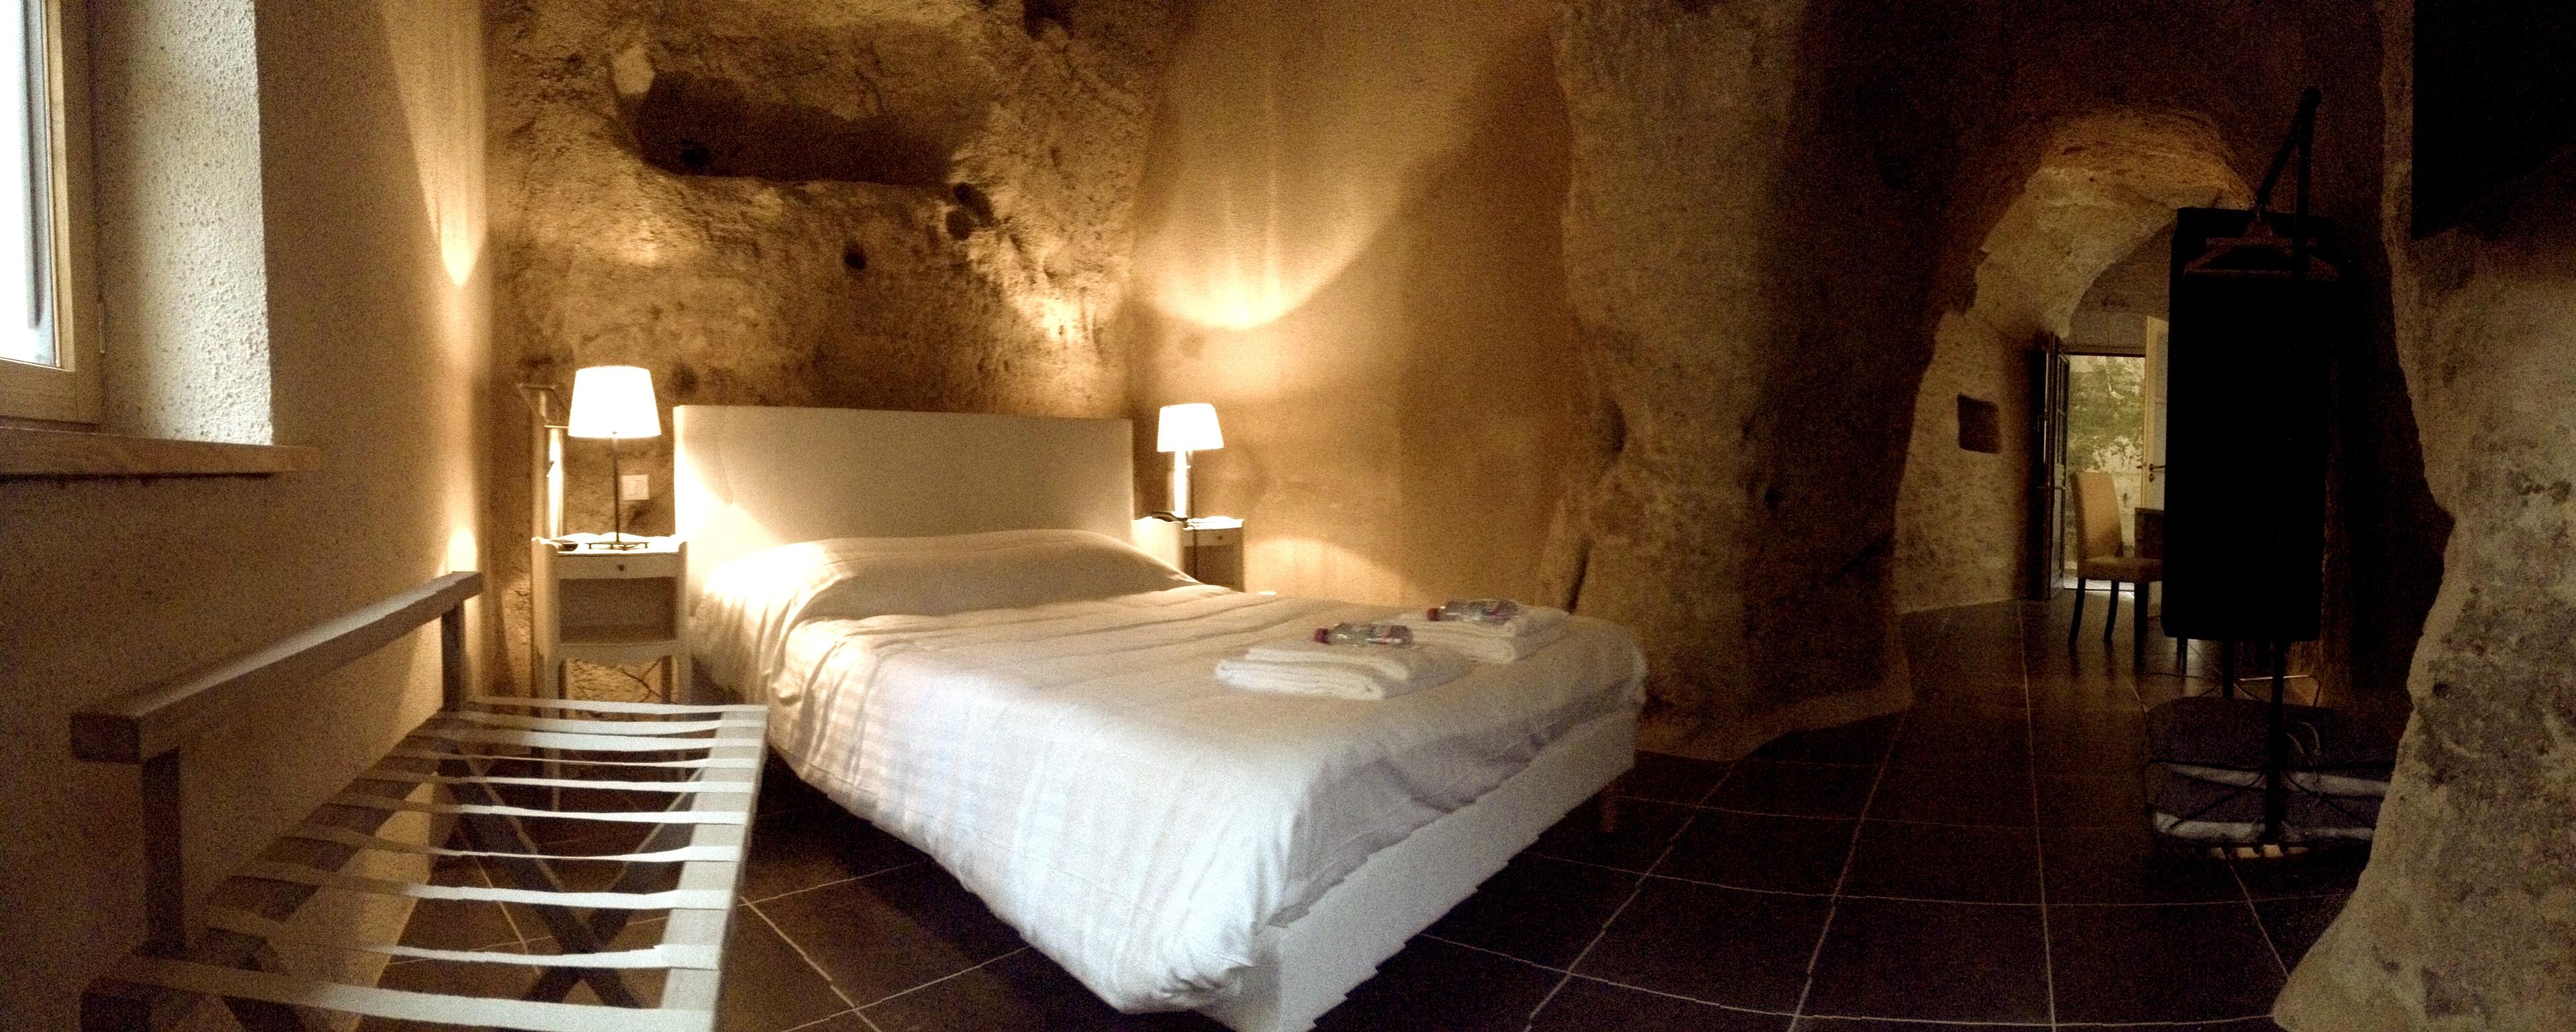 Hotel Troglodyte Saumur Avec Piscine